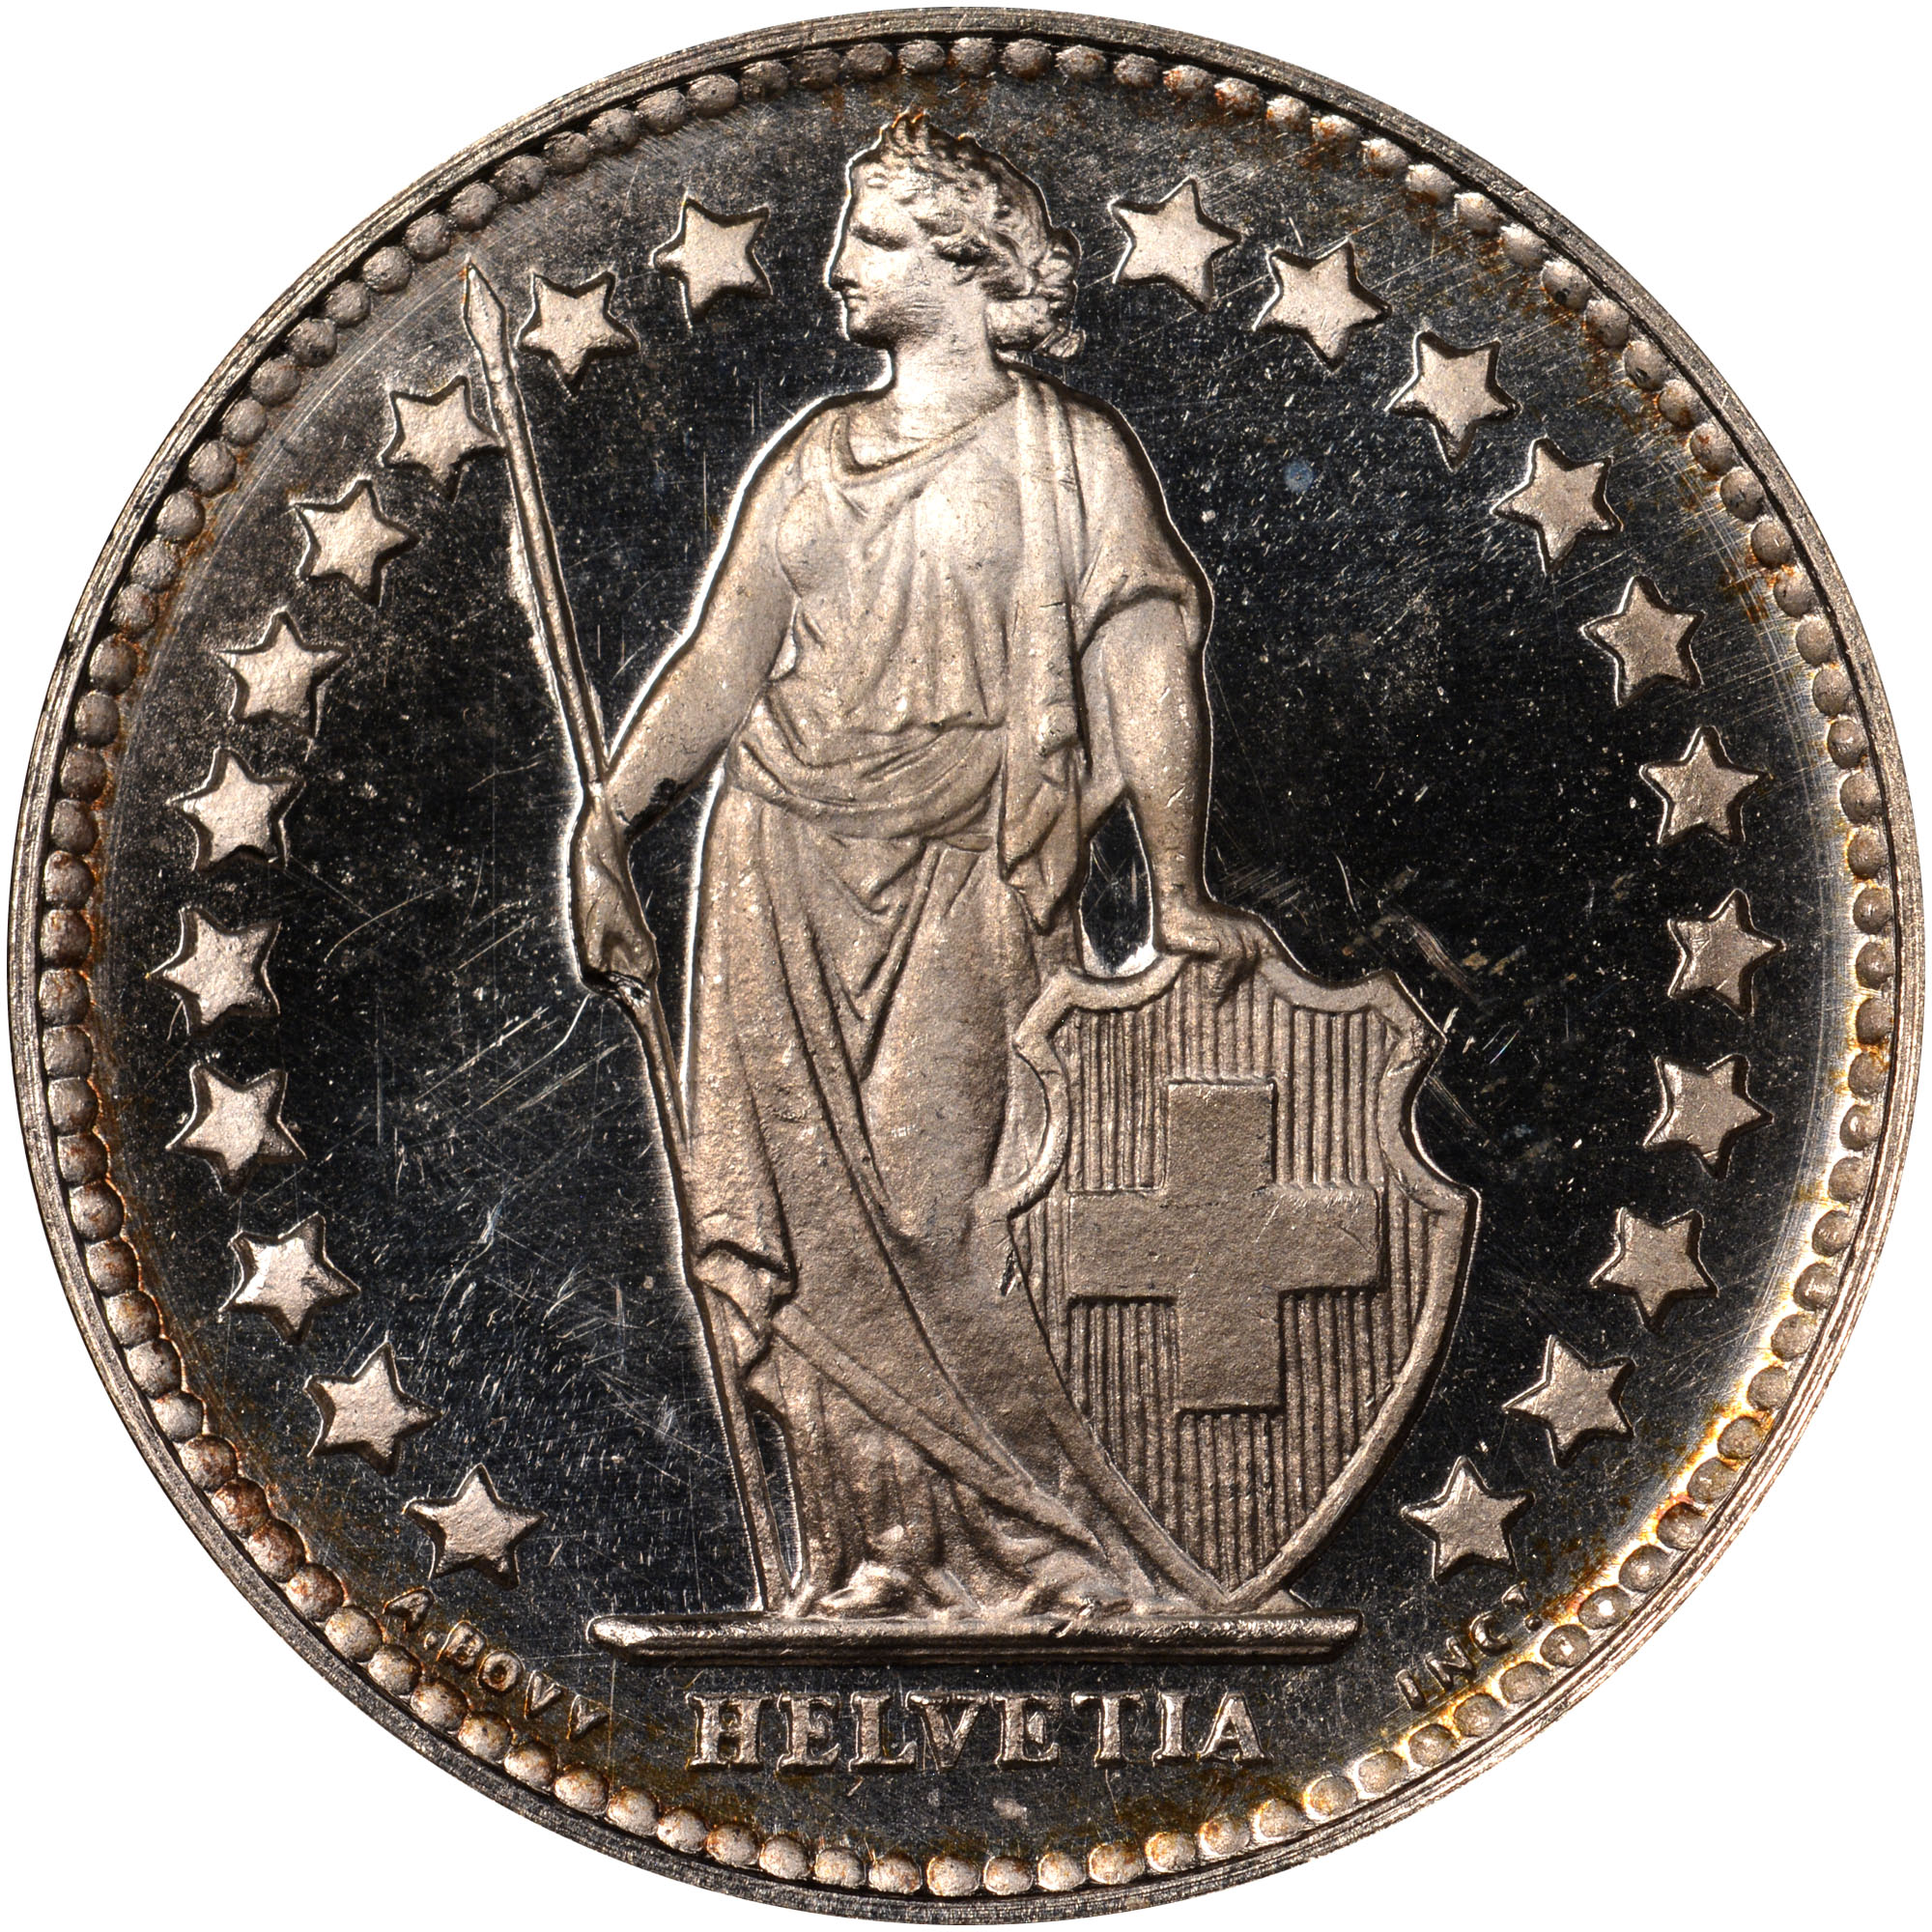 1875-1967 Switzerland 1/2 Franc obverse